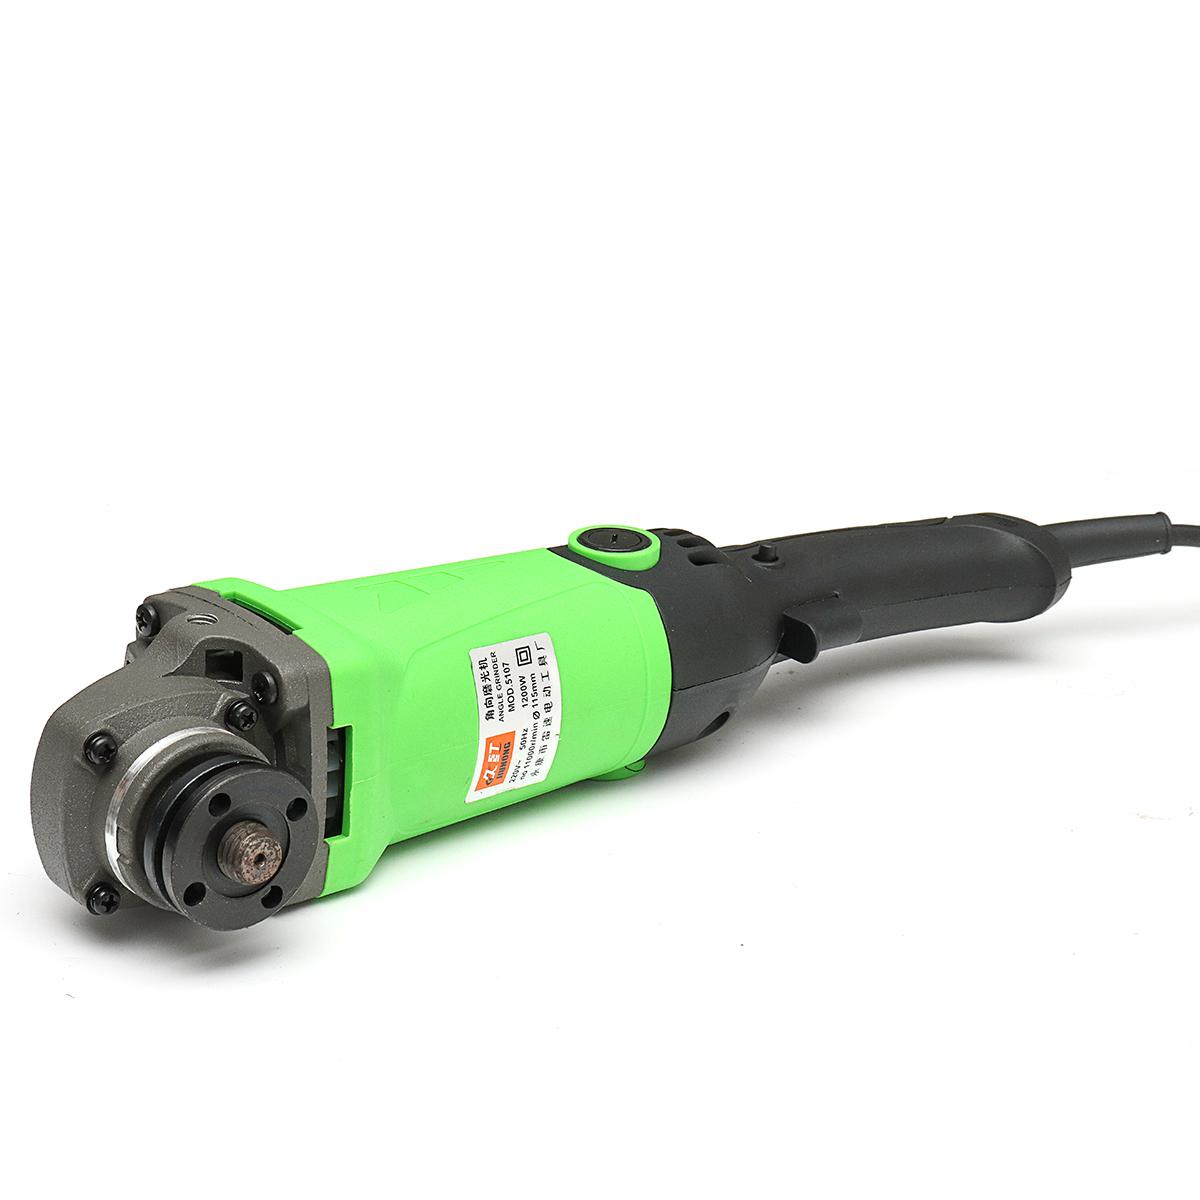 220V 1200W Multipurpose Angle Grinder 6 Levels Speed Adjustable Polishing Machine Grinding Tools